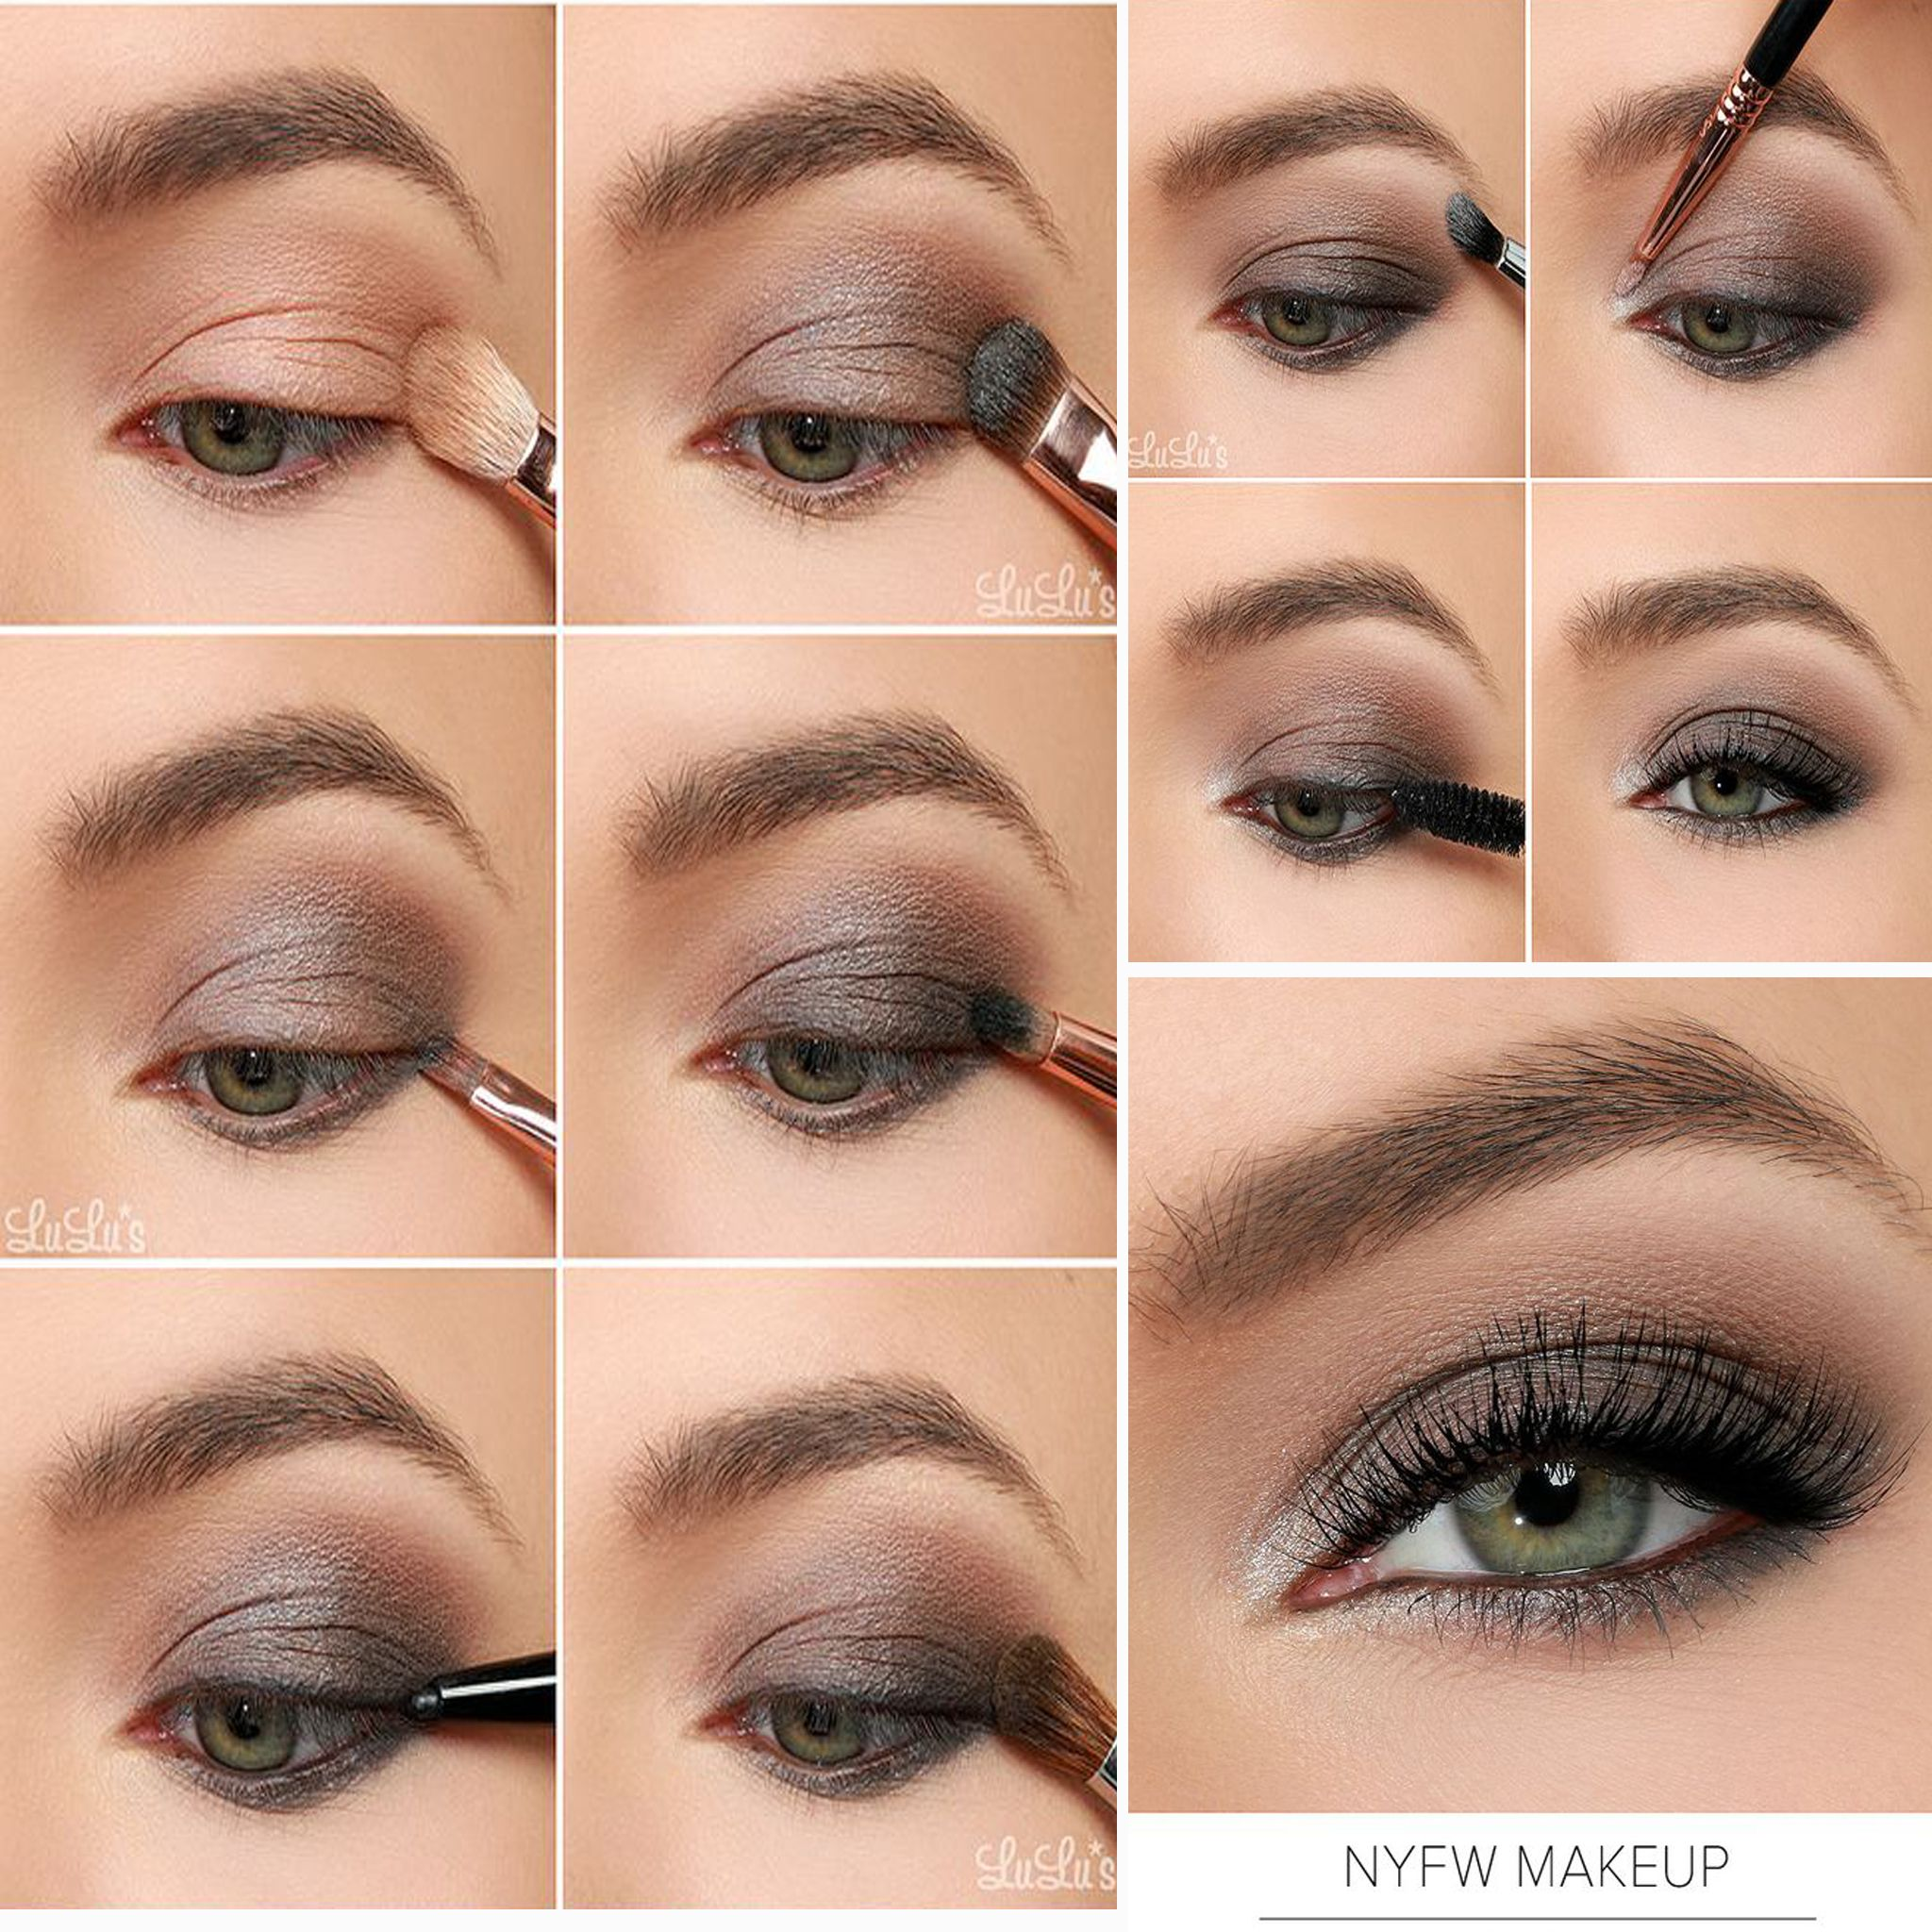 5 step by step smokey eye makeup tutorials for beginners